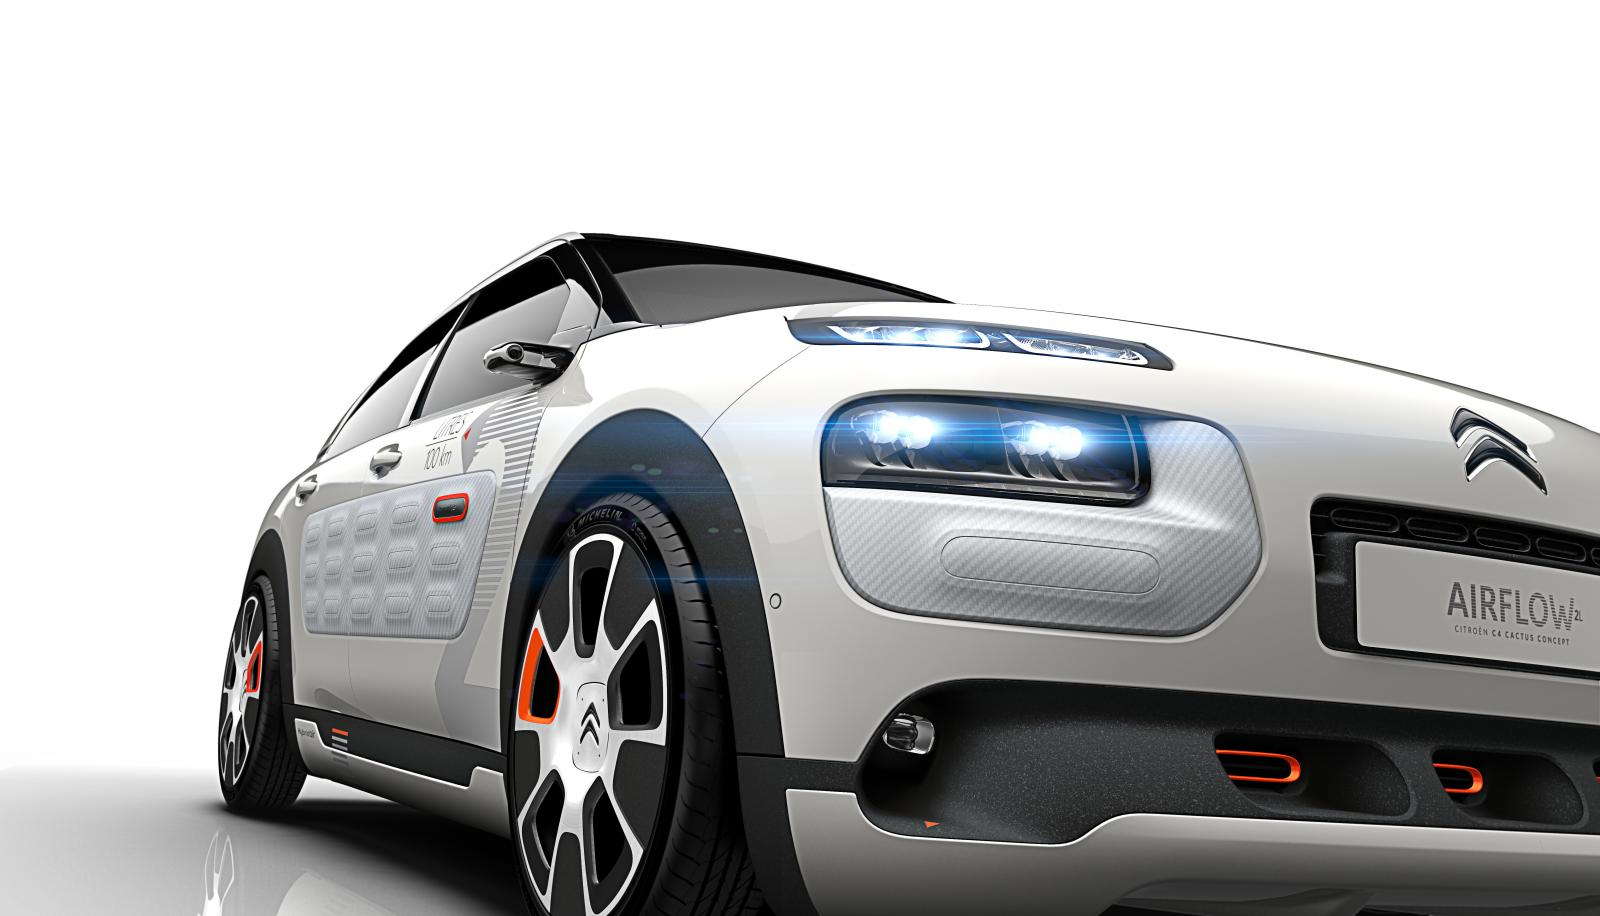 Concept-Car C4 Cactus Airflow 2014 zoom avant